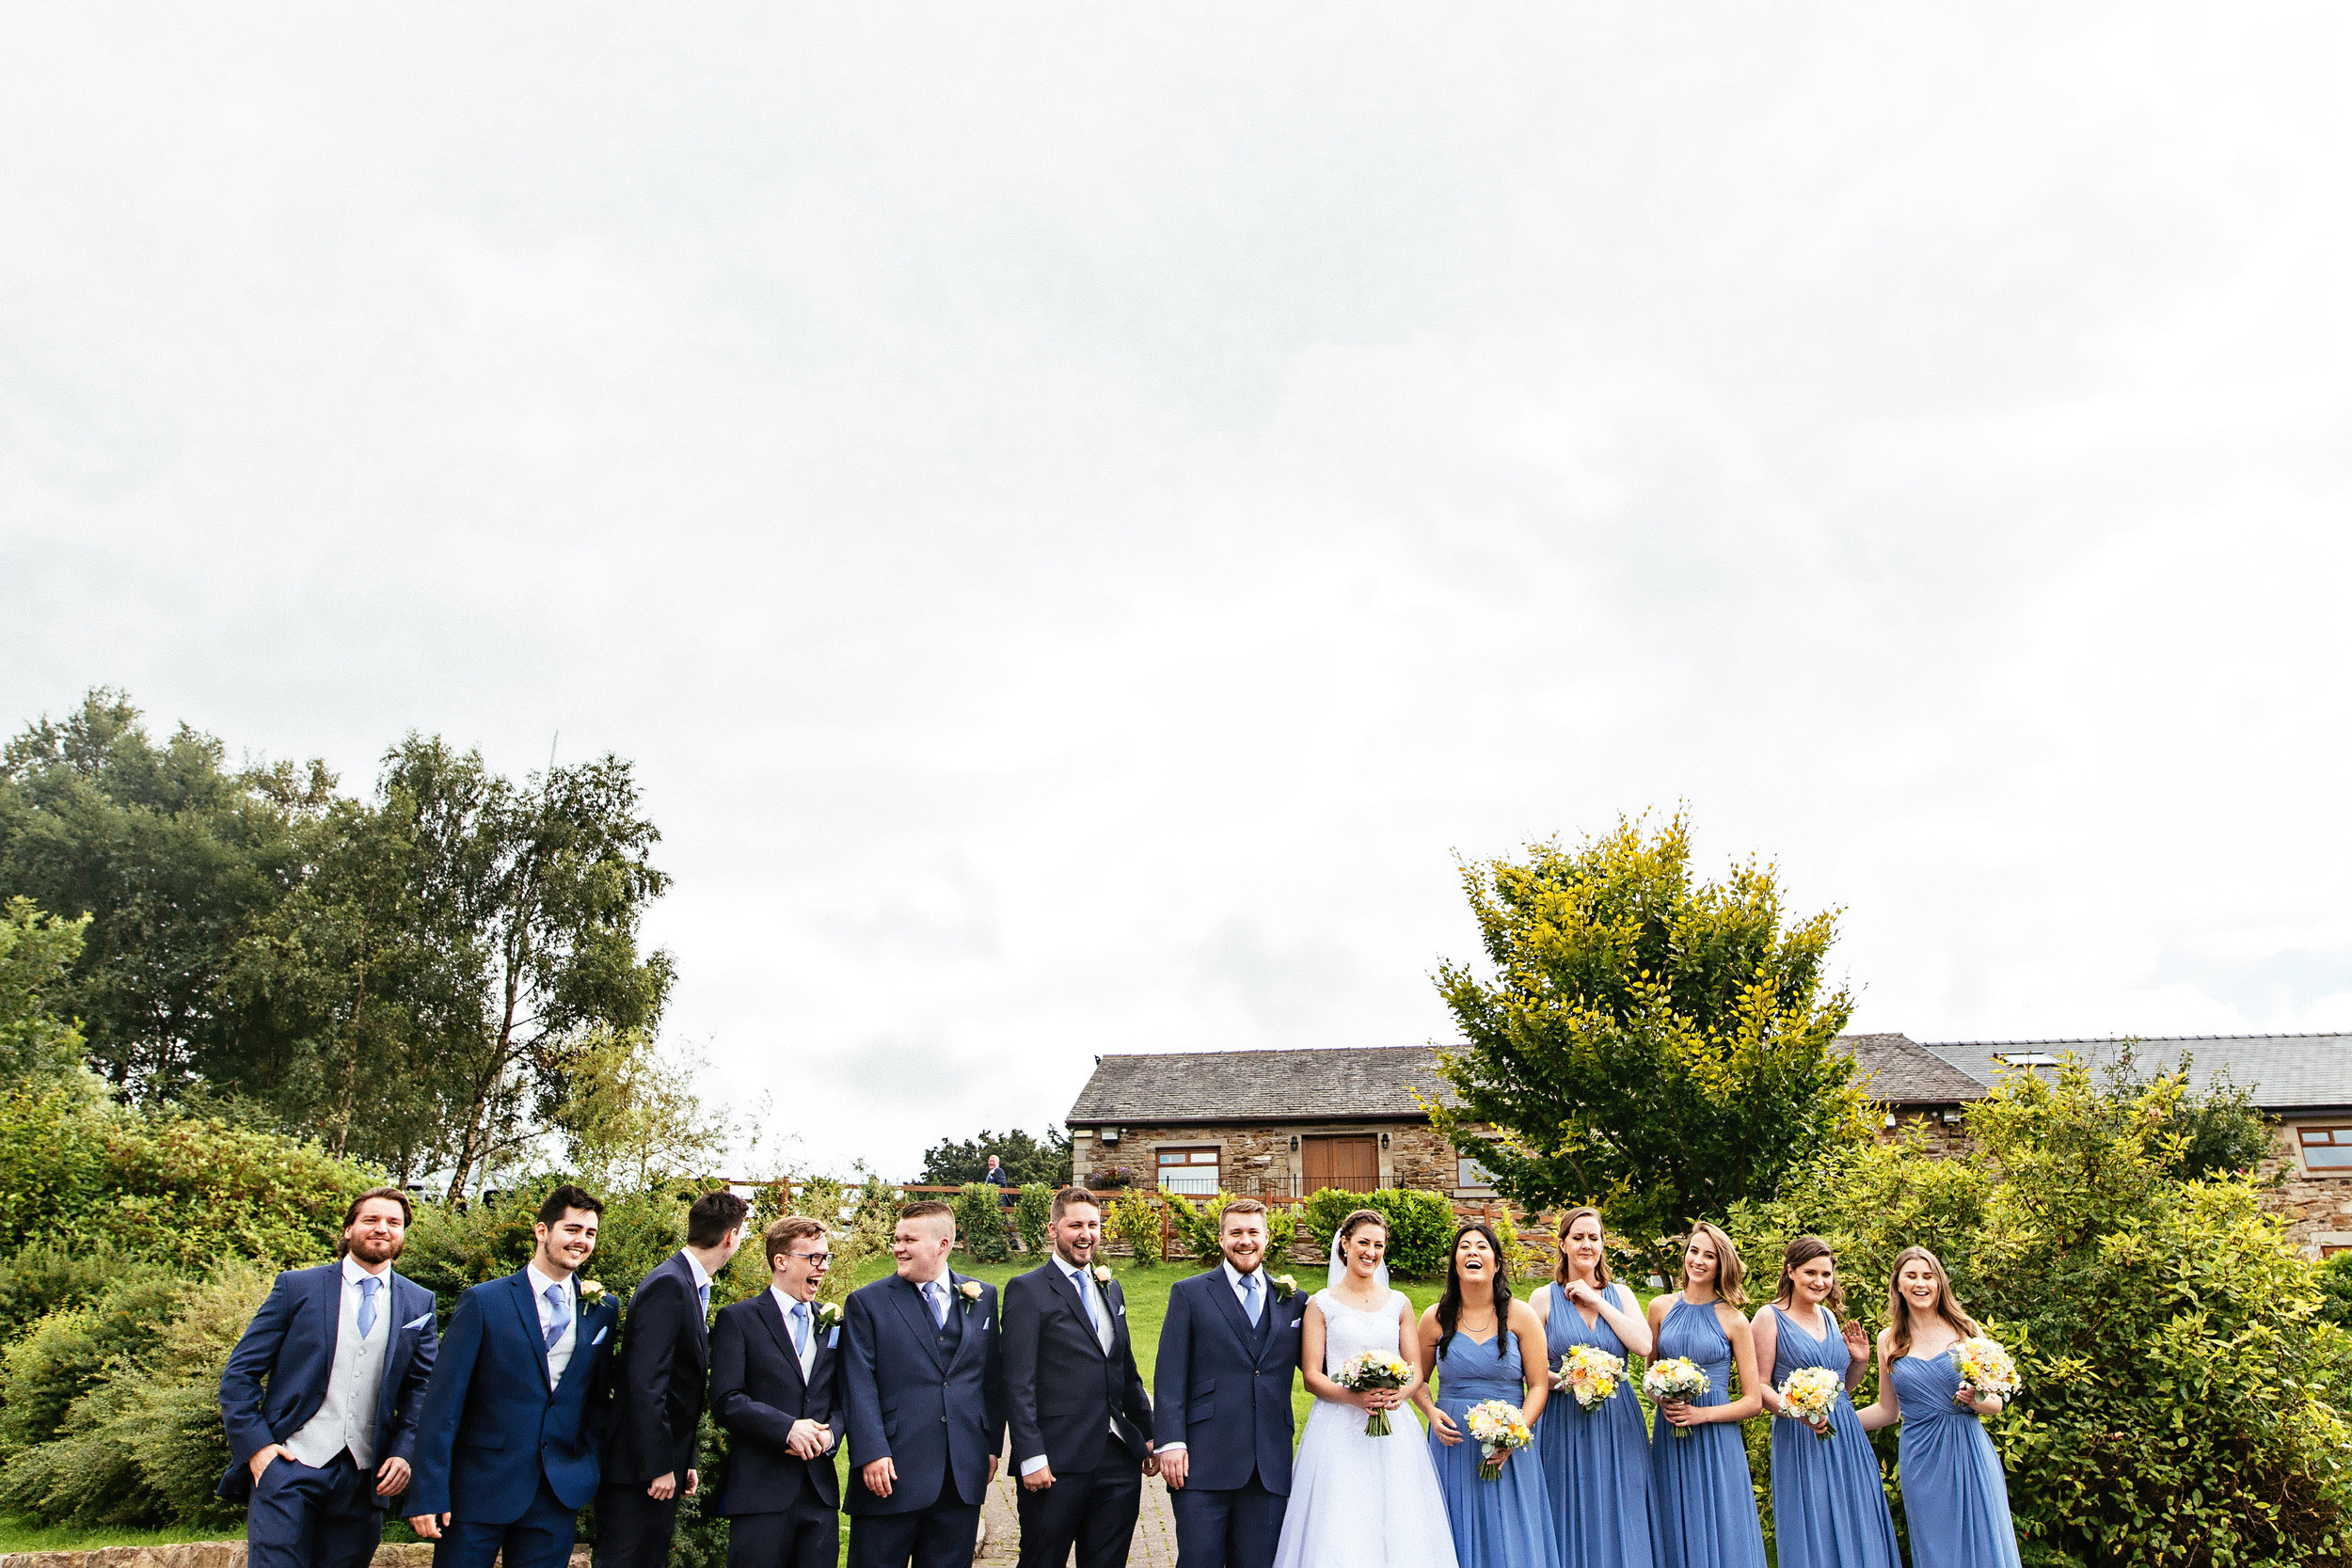 Kathryn-and-Mike-Wedding-Highlights-51.jpg